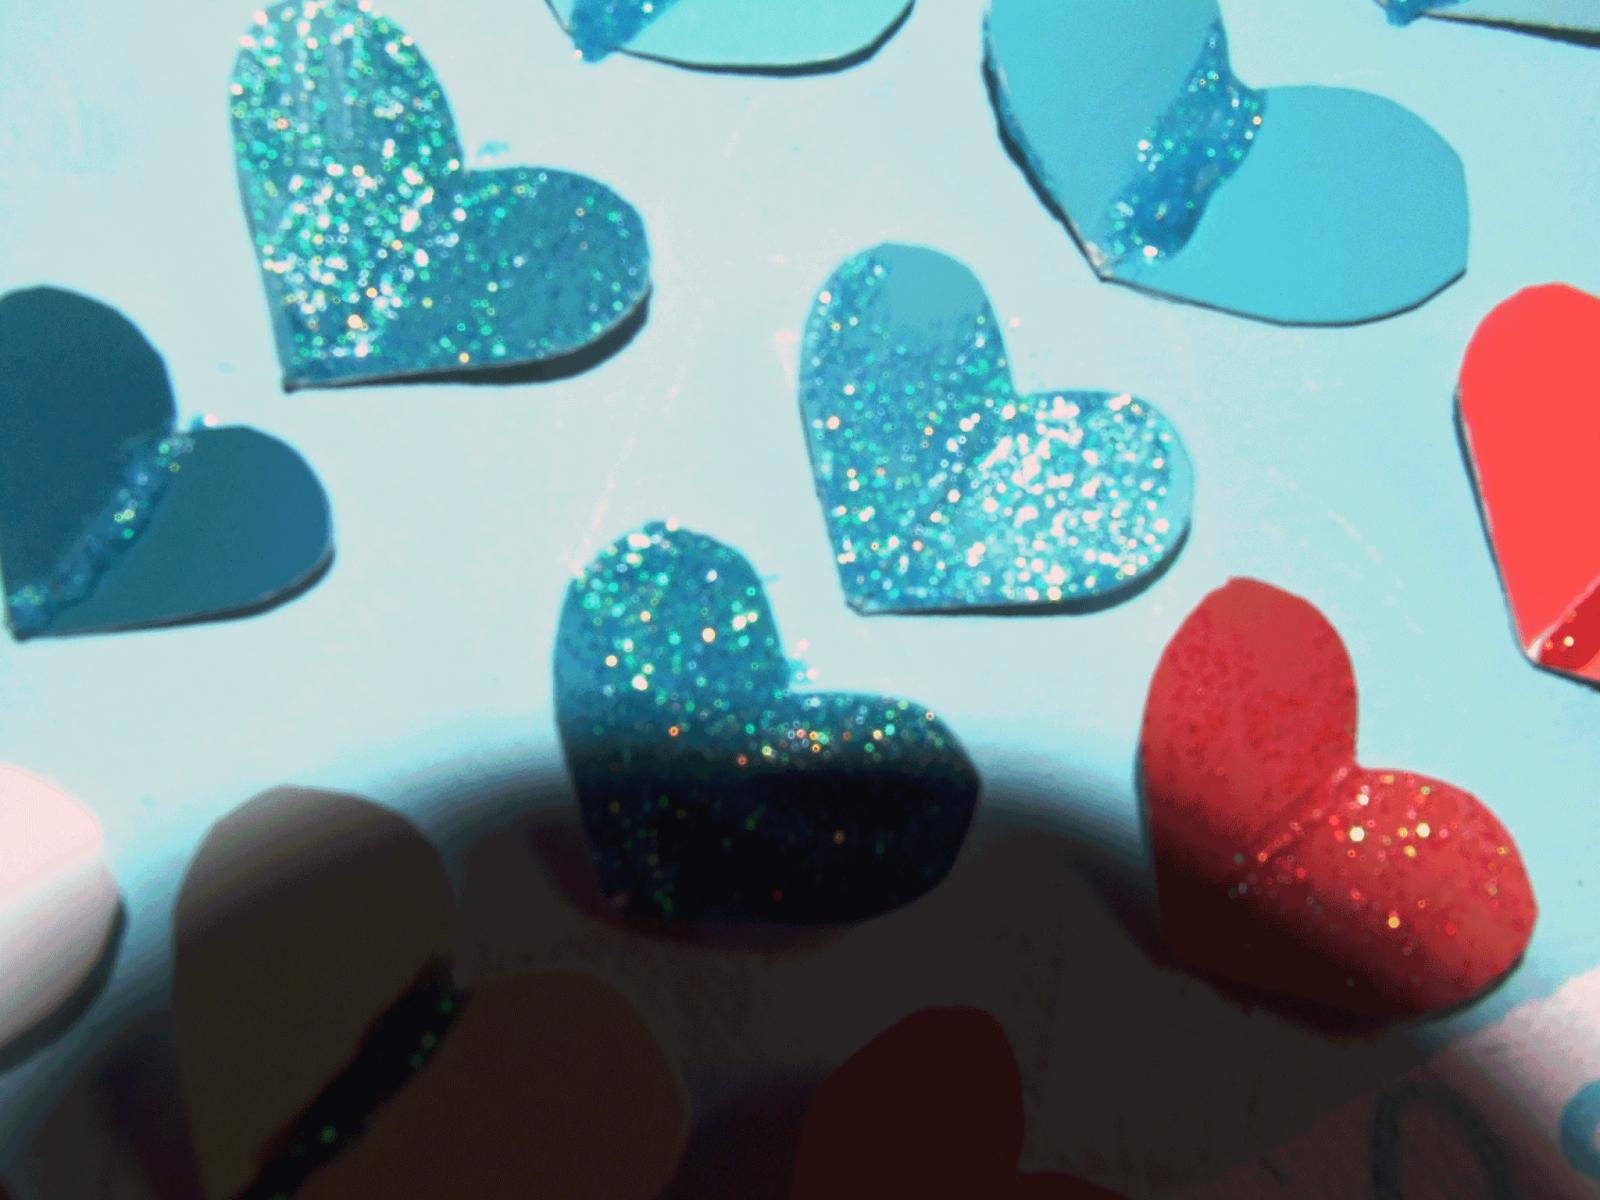 Glittered hearts